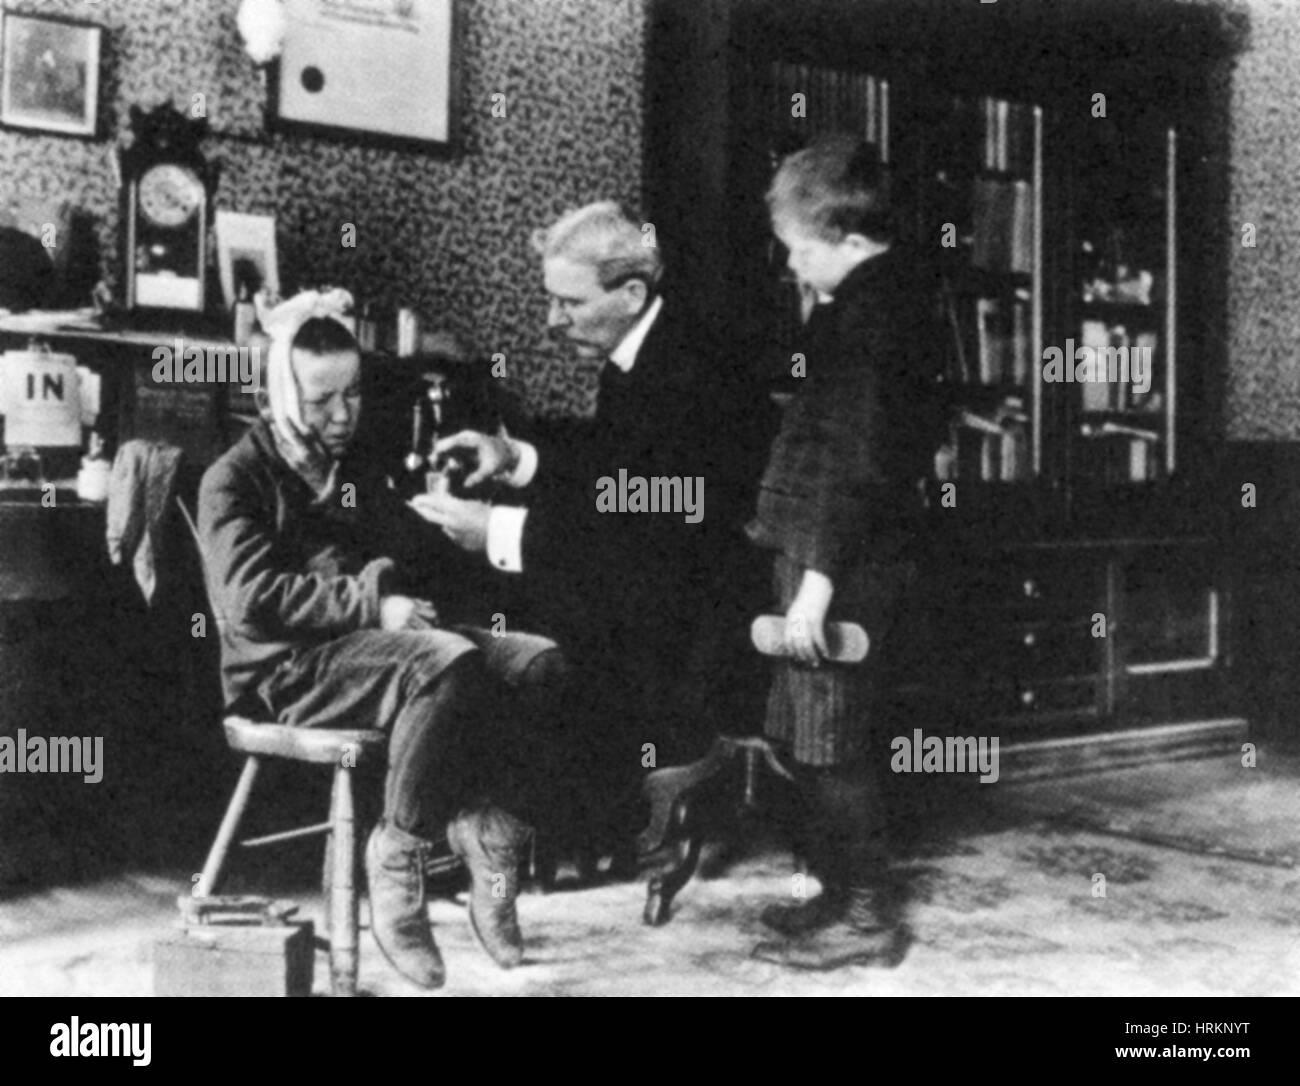 Doctor Treating Boy, 1900 - Stock Image